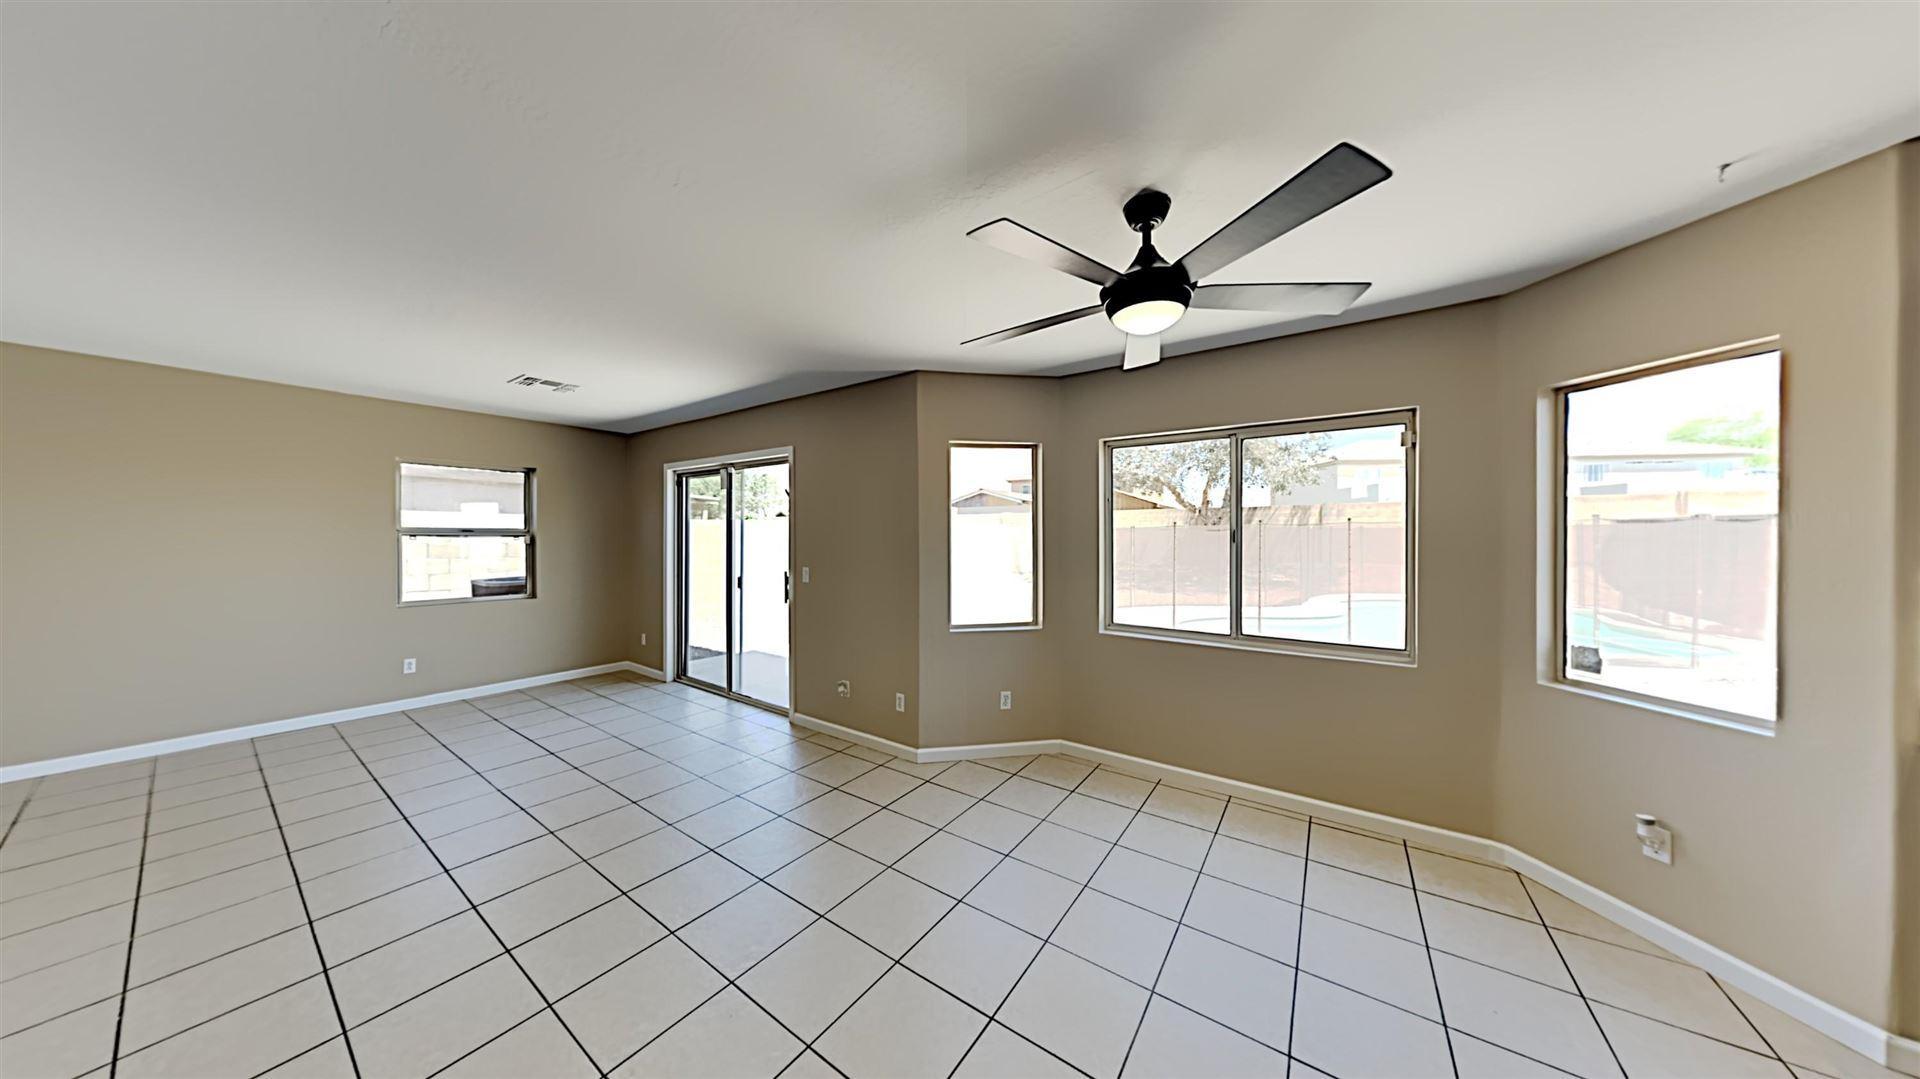 Photo of 12714 W SCOTTS Drive, El Mirage, AZ 85335 (MLS # 6230736)